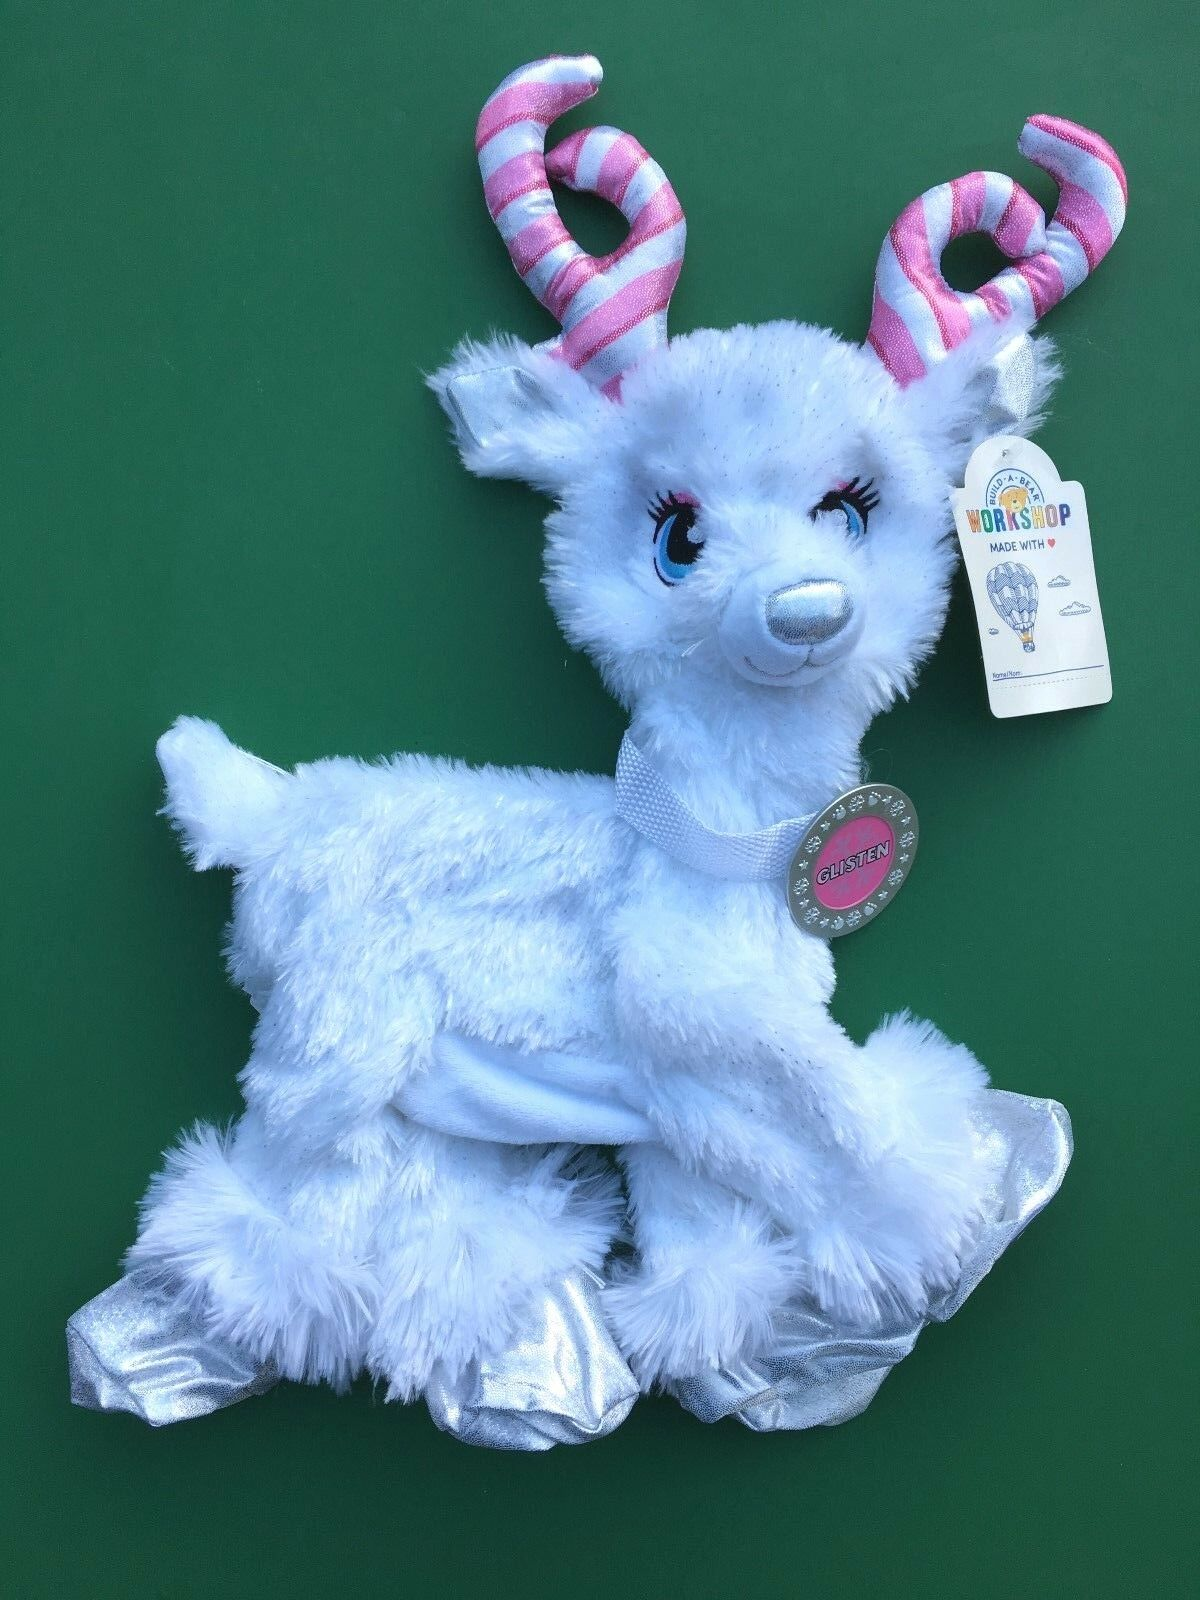 Build a Bear 15  2018 Candy Cane Glisten Reindeer Plush Toy - Unstuffed - NWT